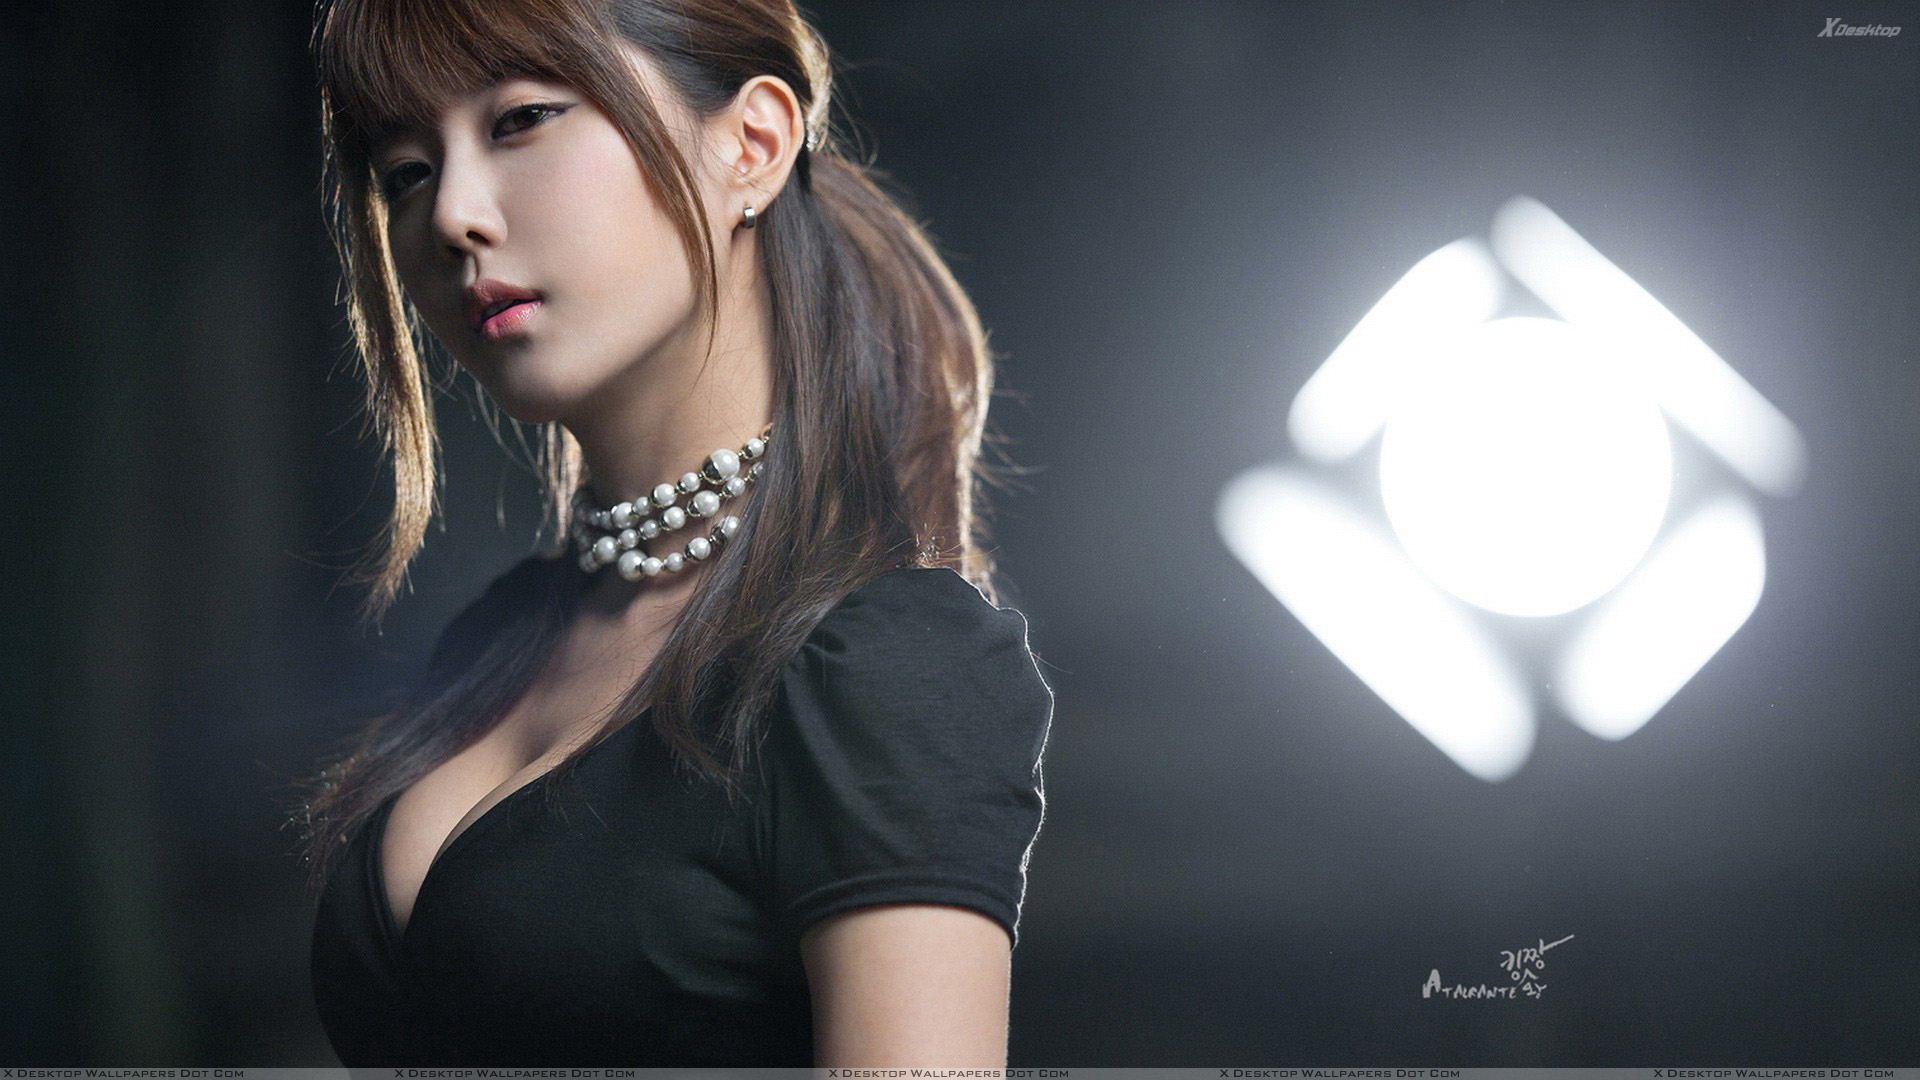 Korean Girls Desktop Wallpapers Top Free Korean Girls Desktop